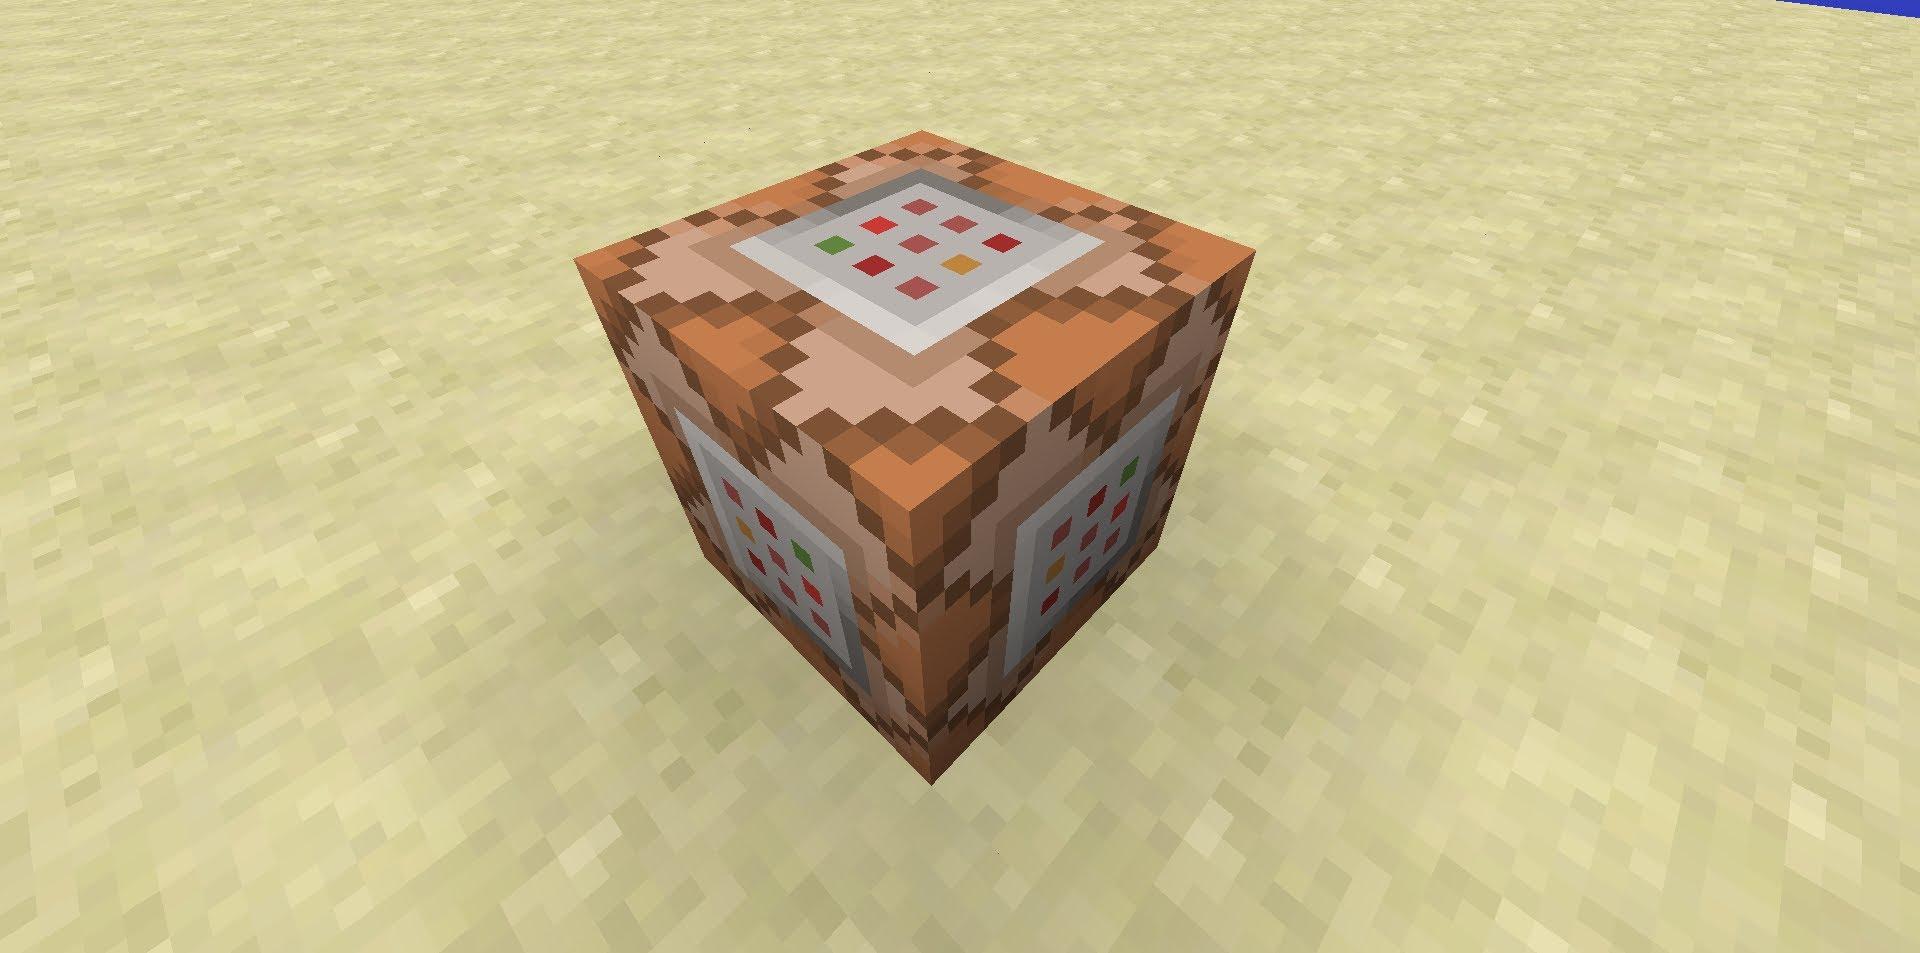 Minecraft Command Block Tutorial 1: Starter Kit: 3 Steps